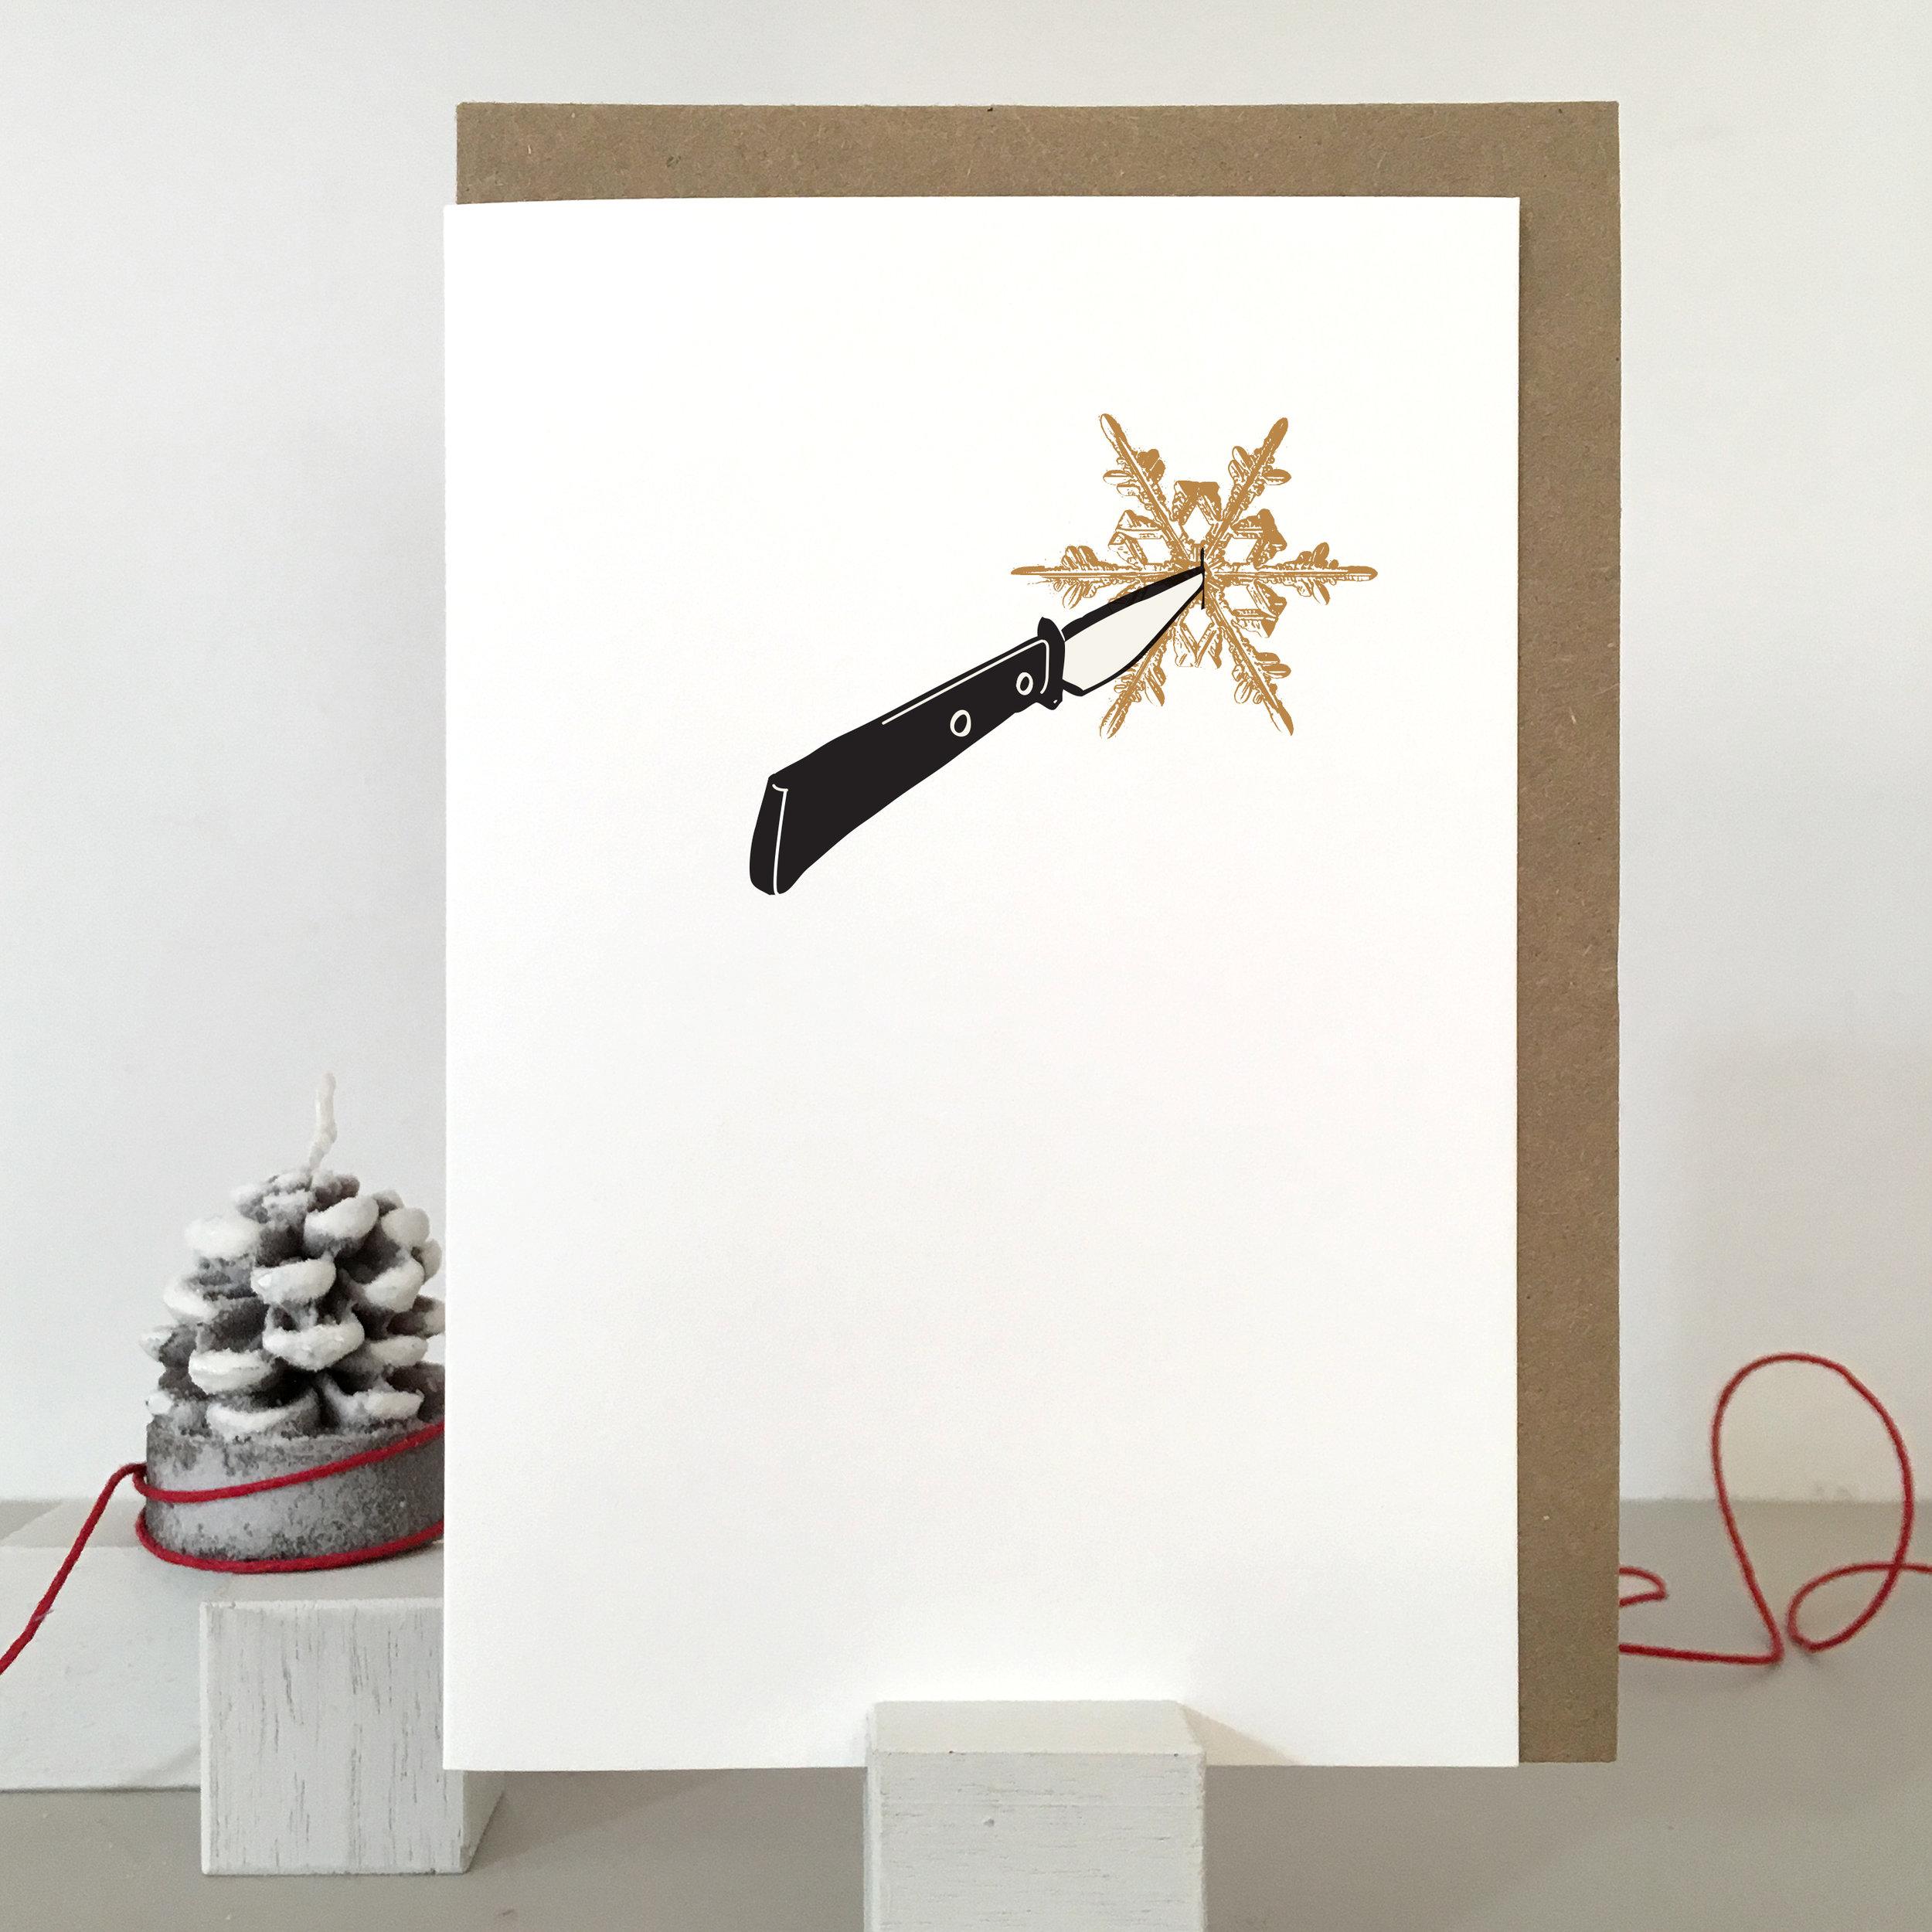 Grumpy Christmas Card: SF04_bah humbug